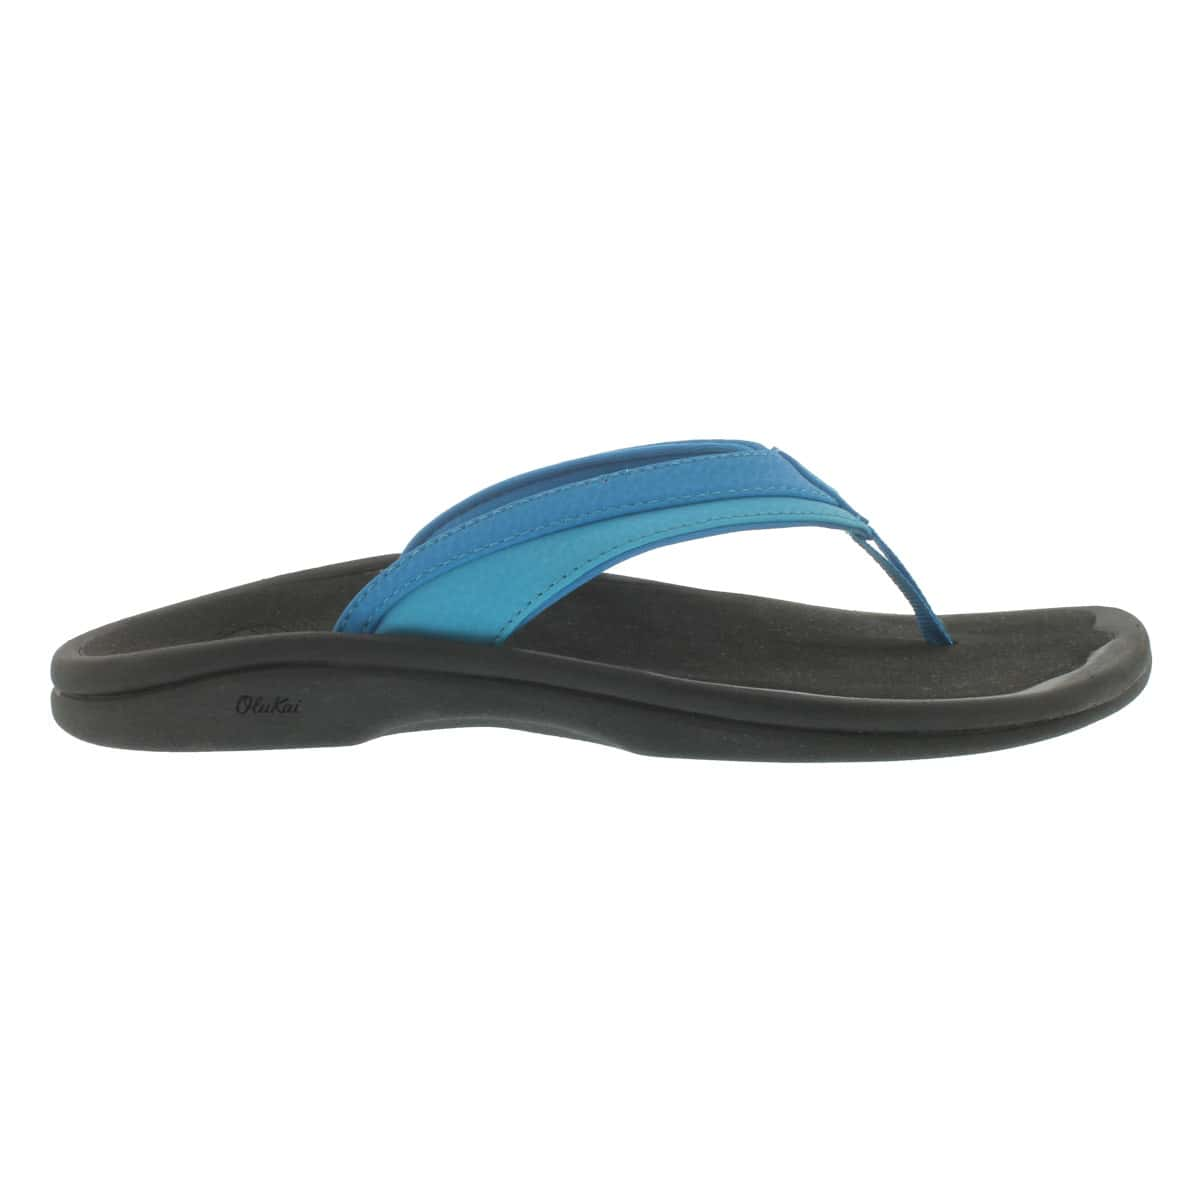 Lds Ohana tropical blue thong sandal